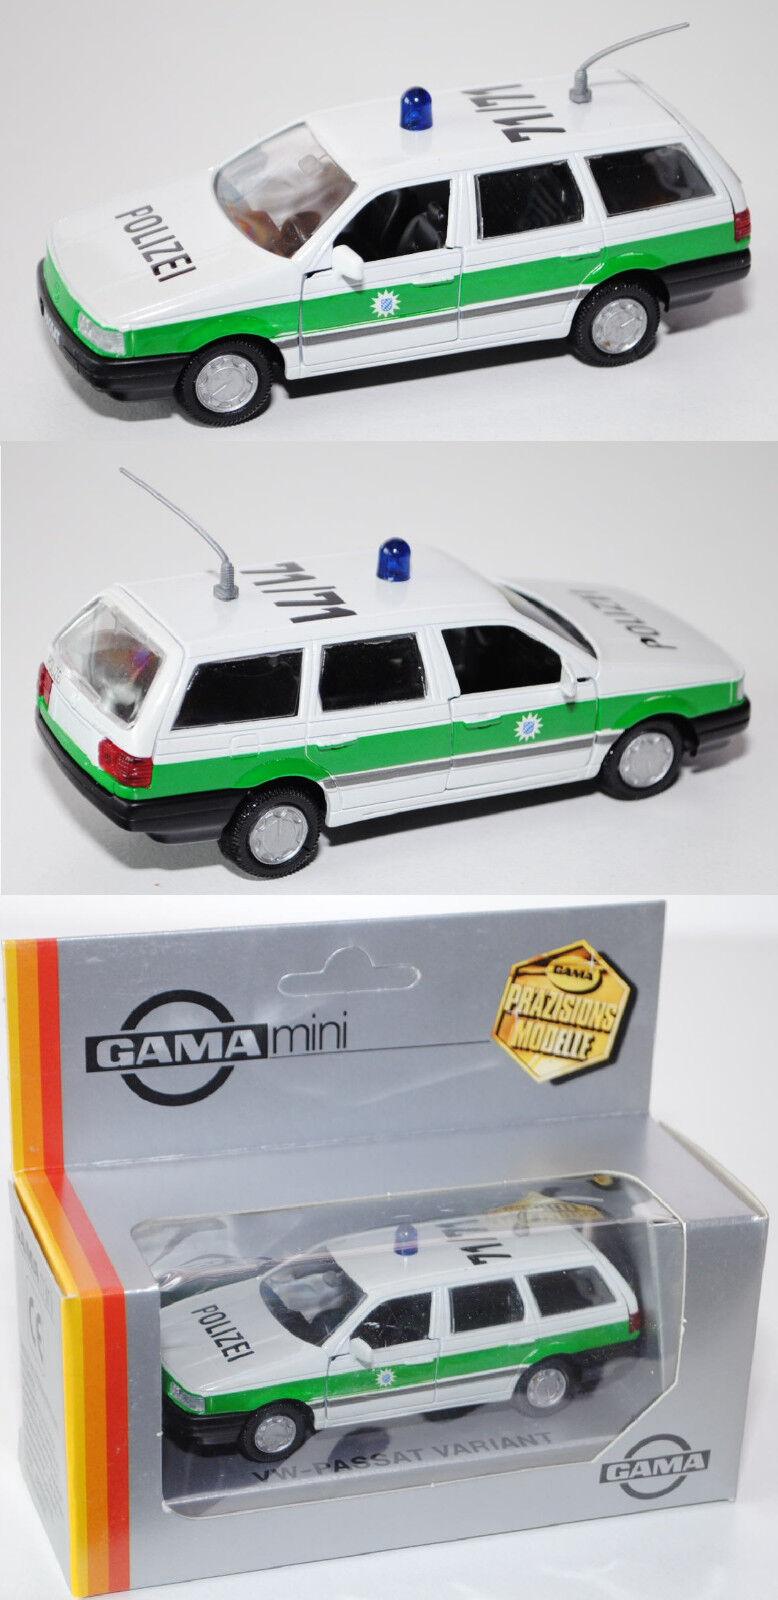 GAMA 1143 VW Passat CL Variant Police (b3, Type 35i), police 71 71, 1 43 neuf dans sa boîte